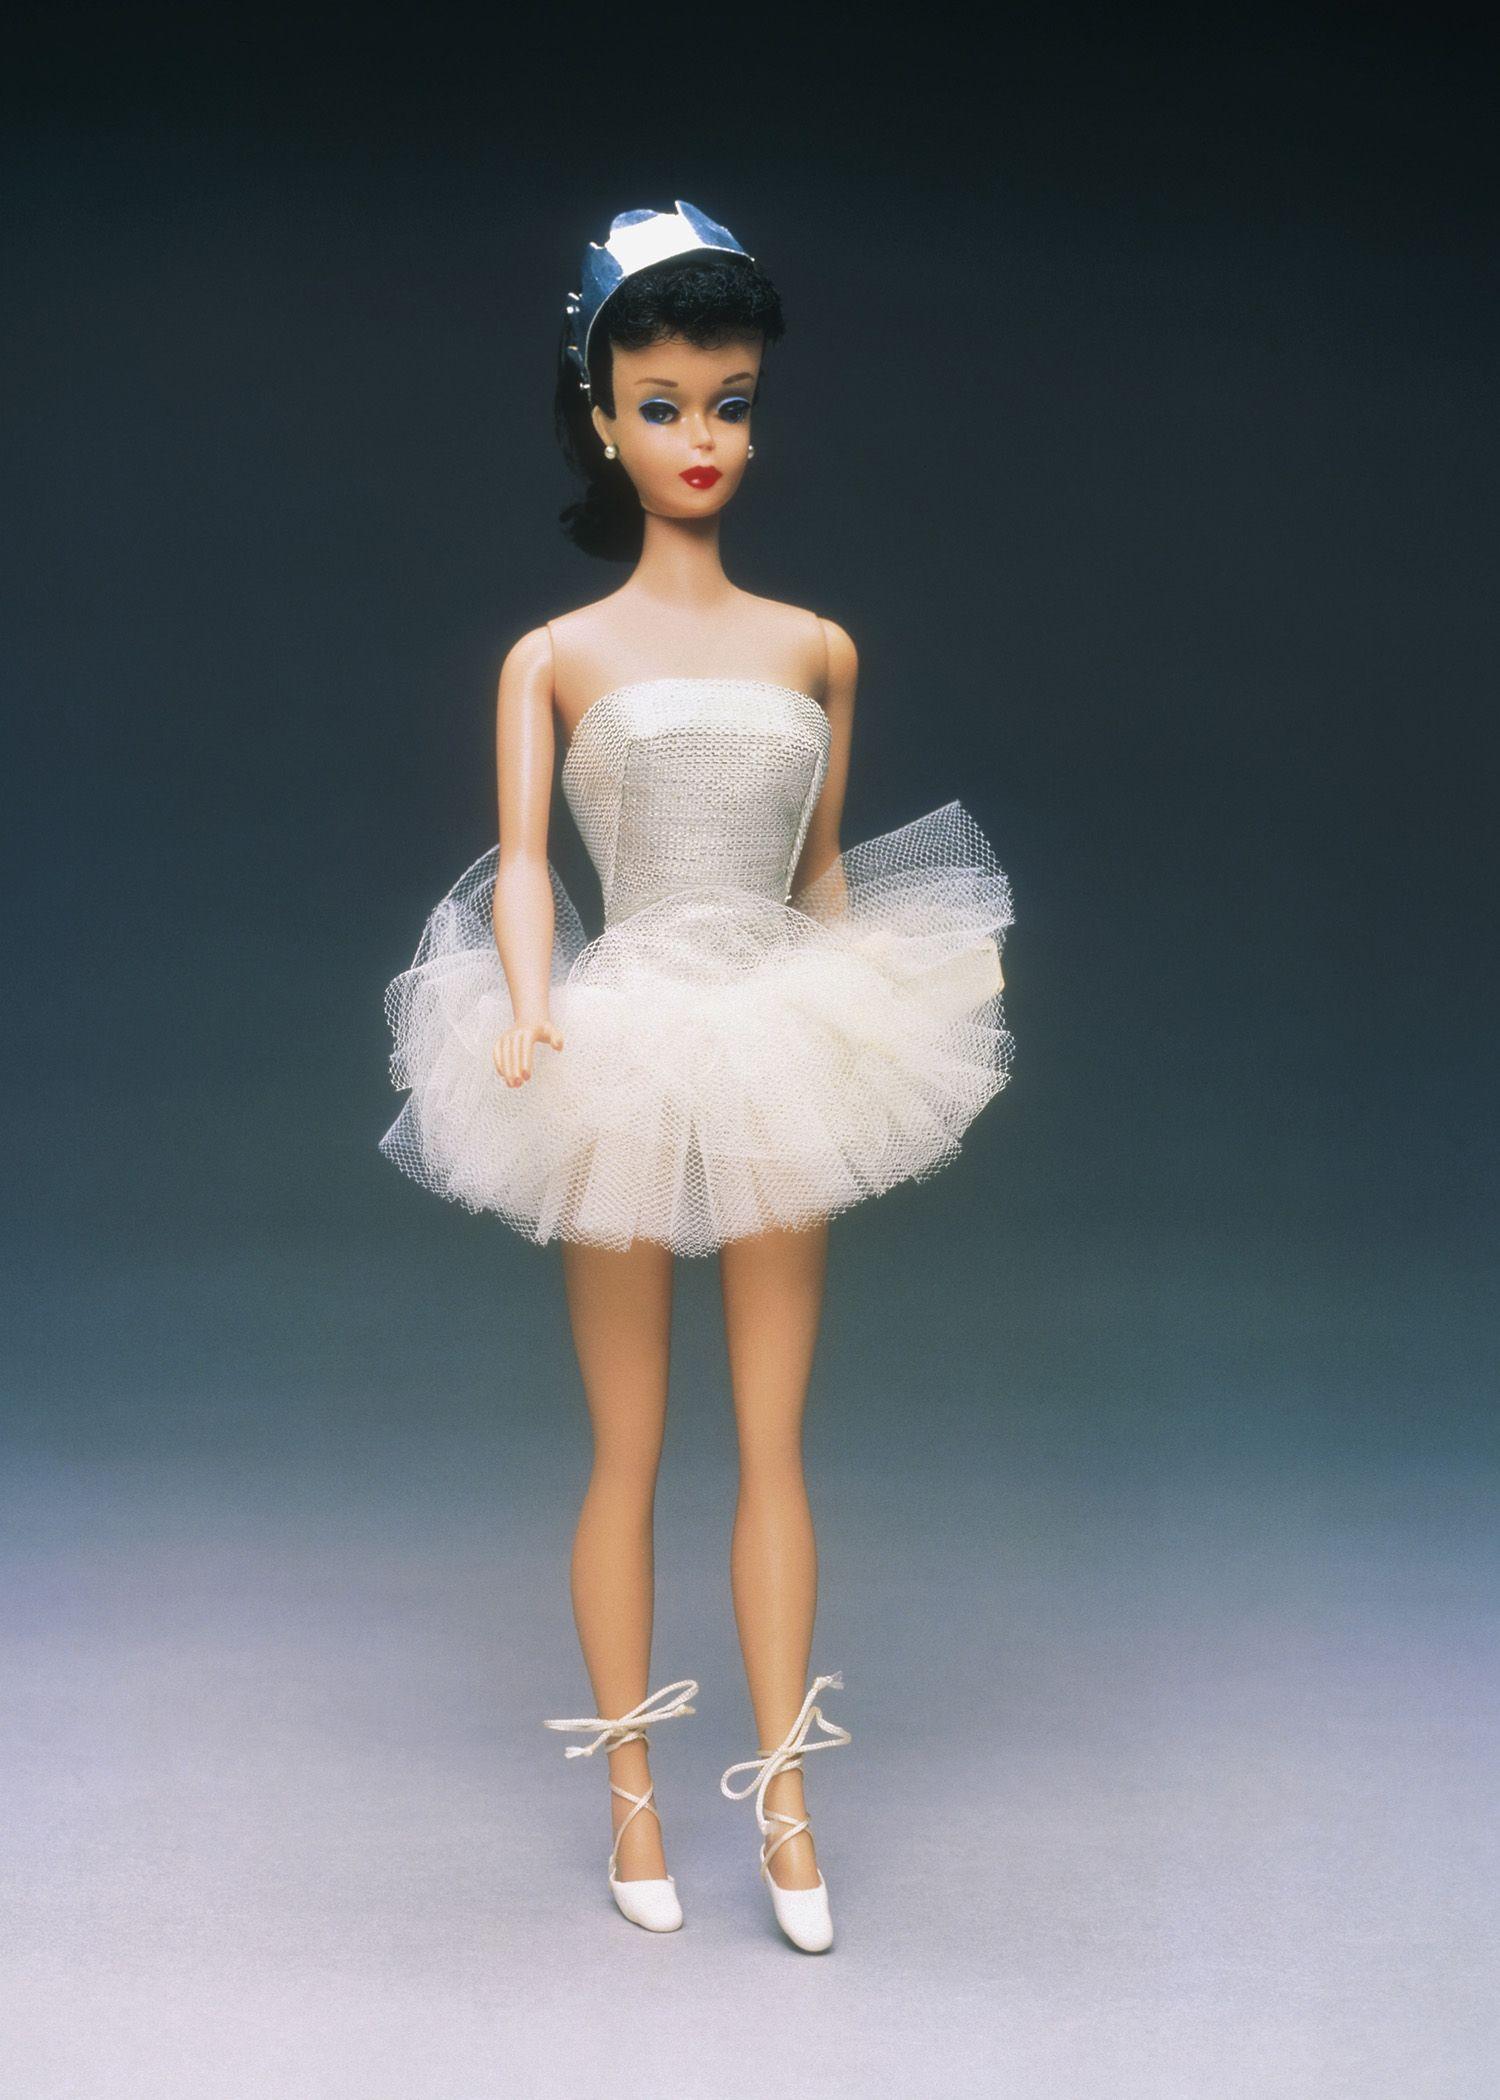 Under Maintenance Ballerina Barbie Vintage Barbie Dolls Barbie